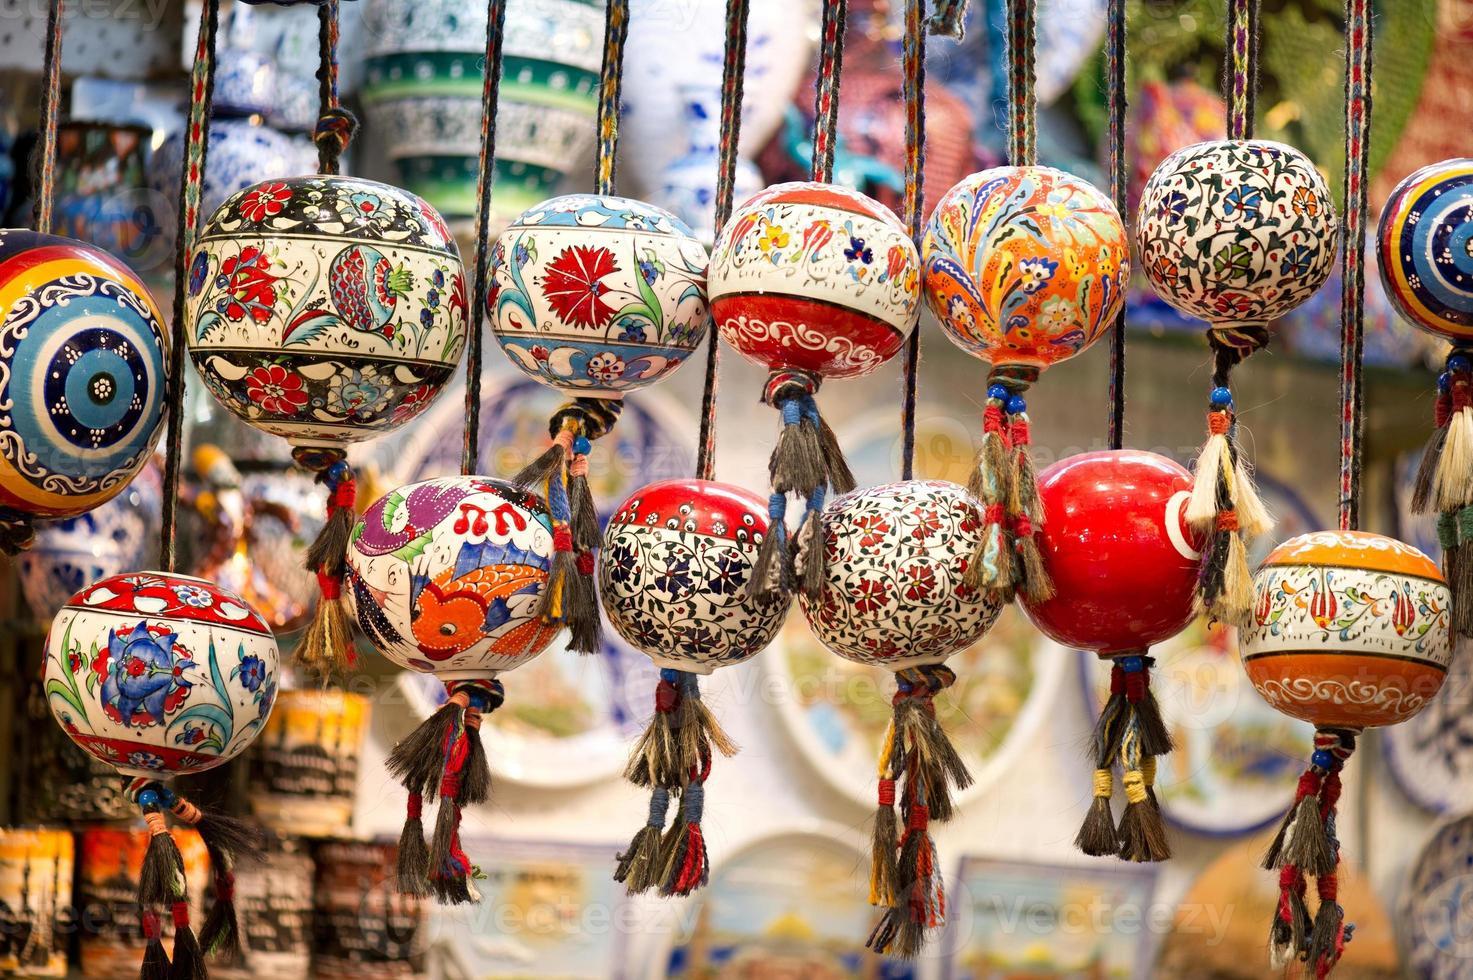 perle orinetali nel Grand Bazaar, Istanbul, Turchia foto